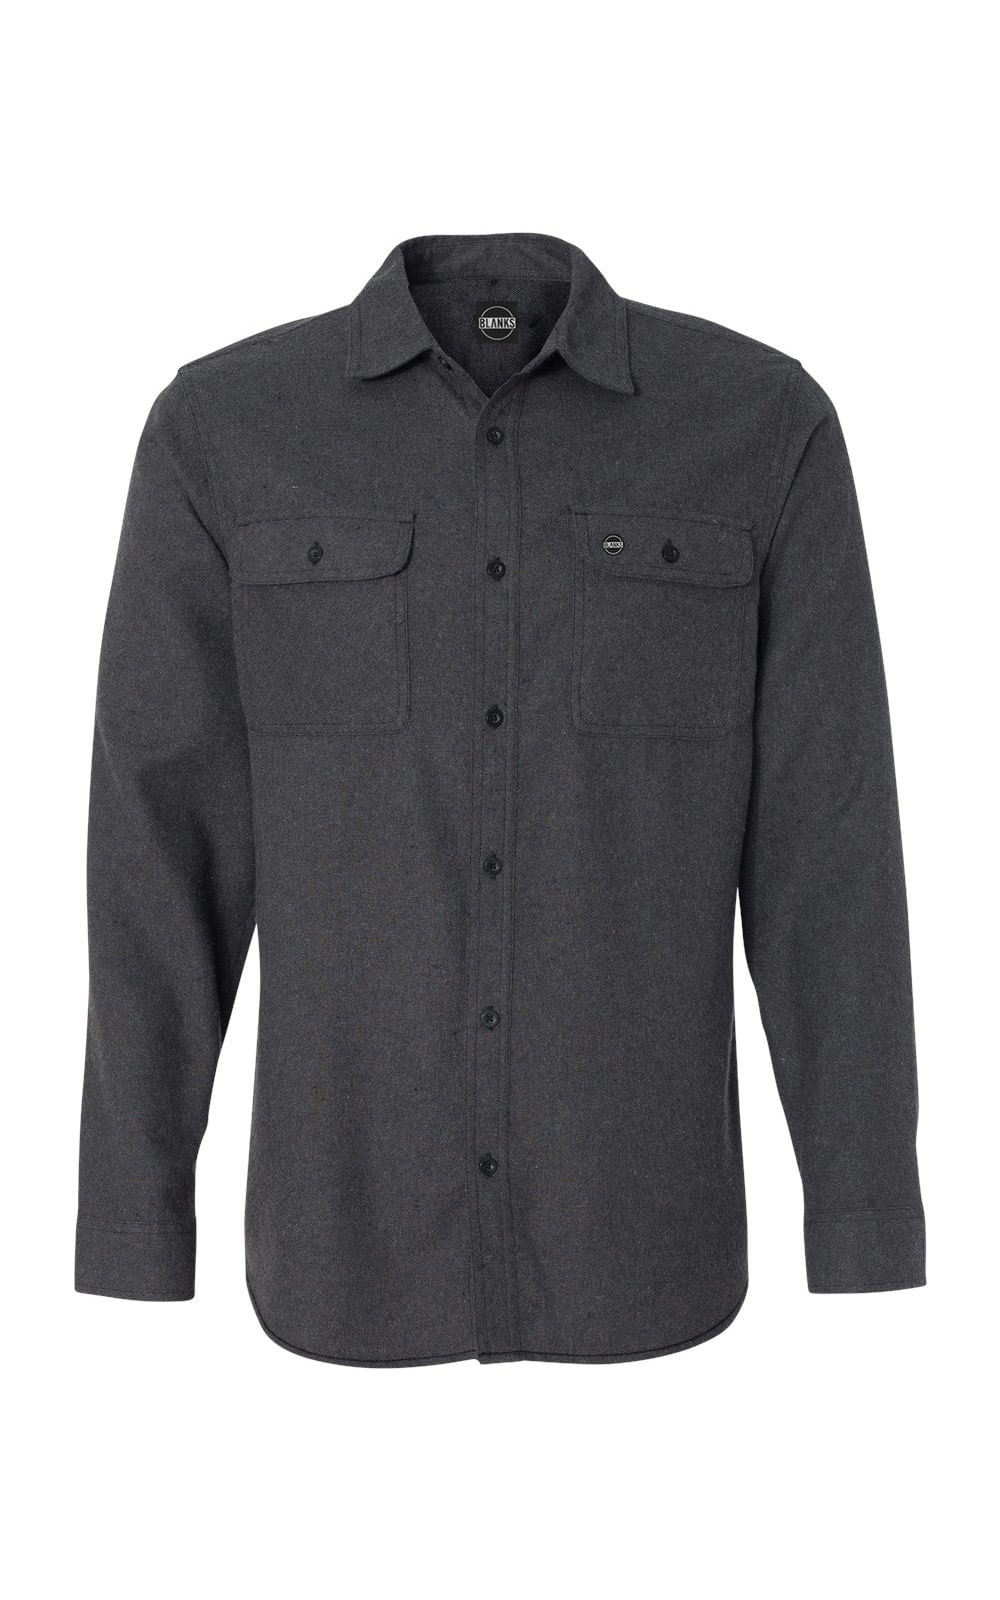 Camisa-Flanela-BKS-8200-Charcoal-01